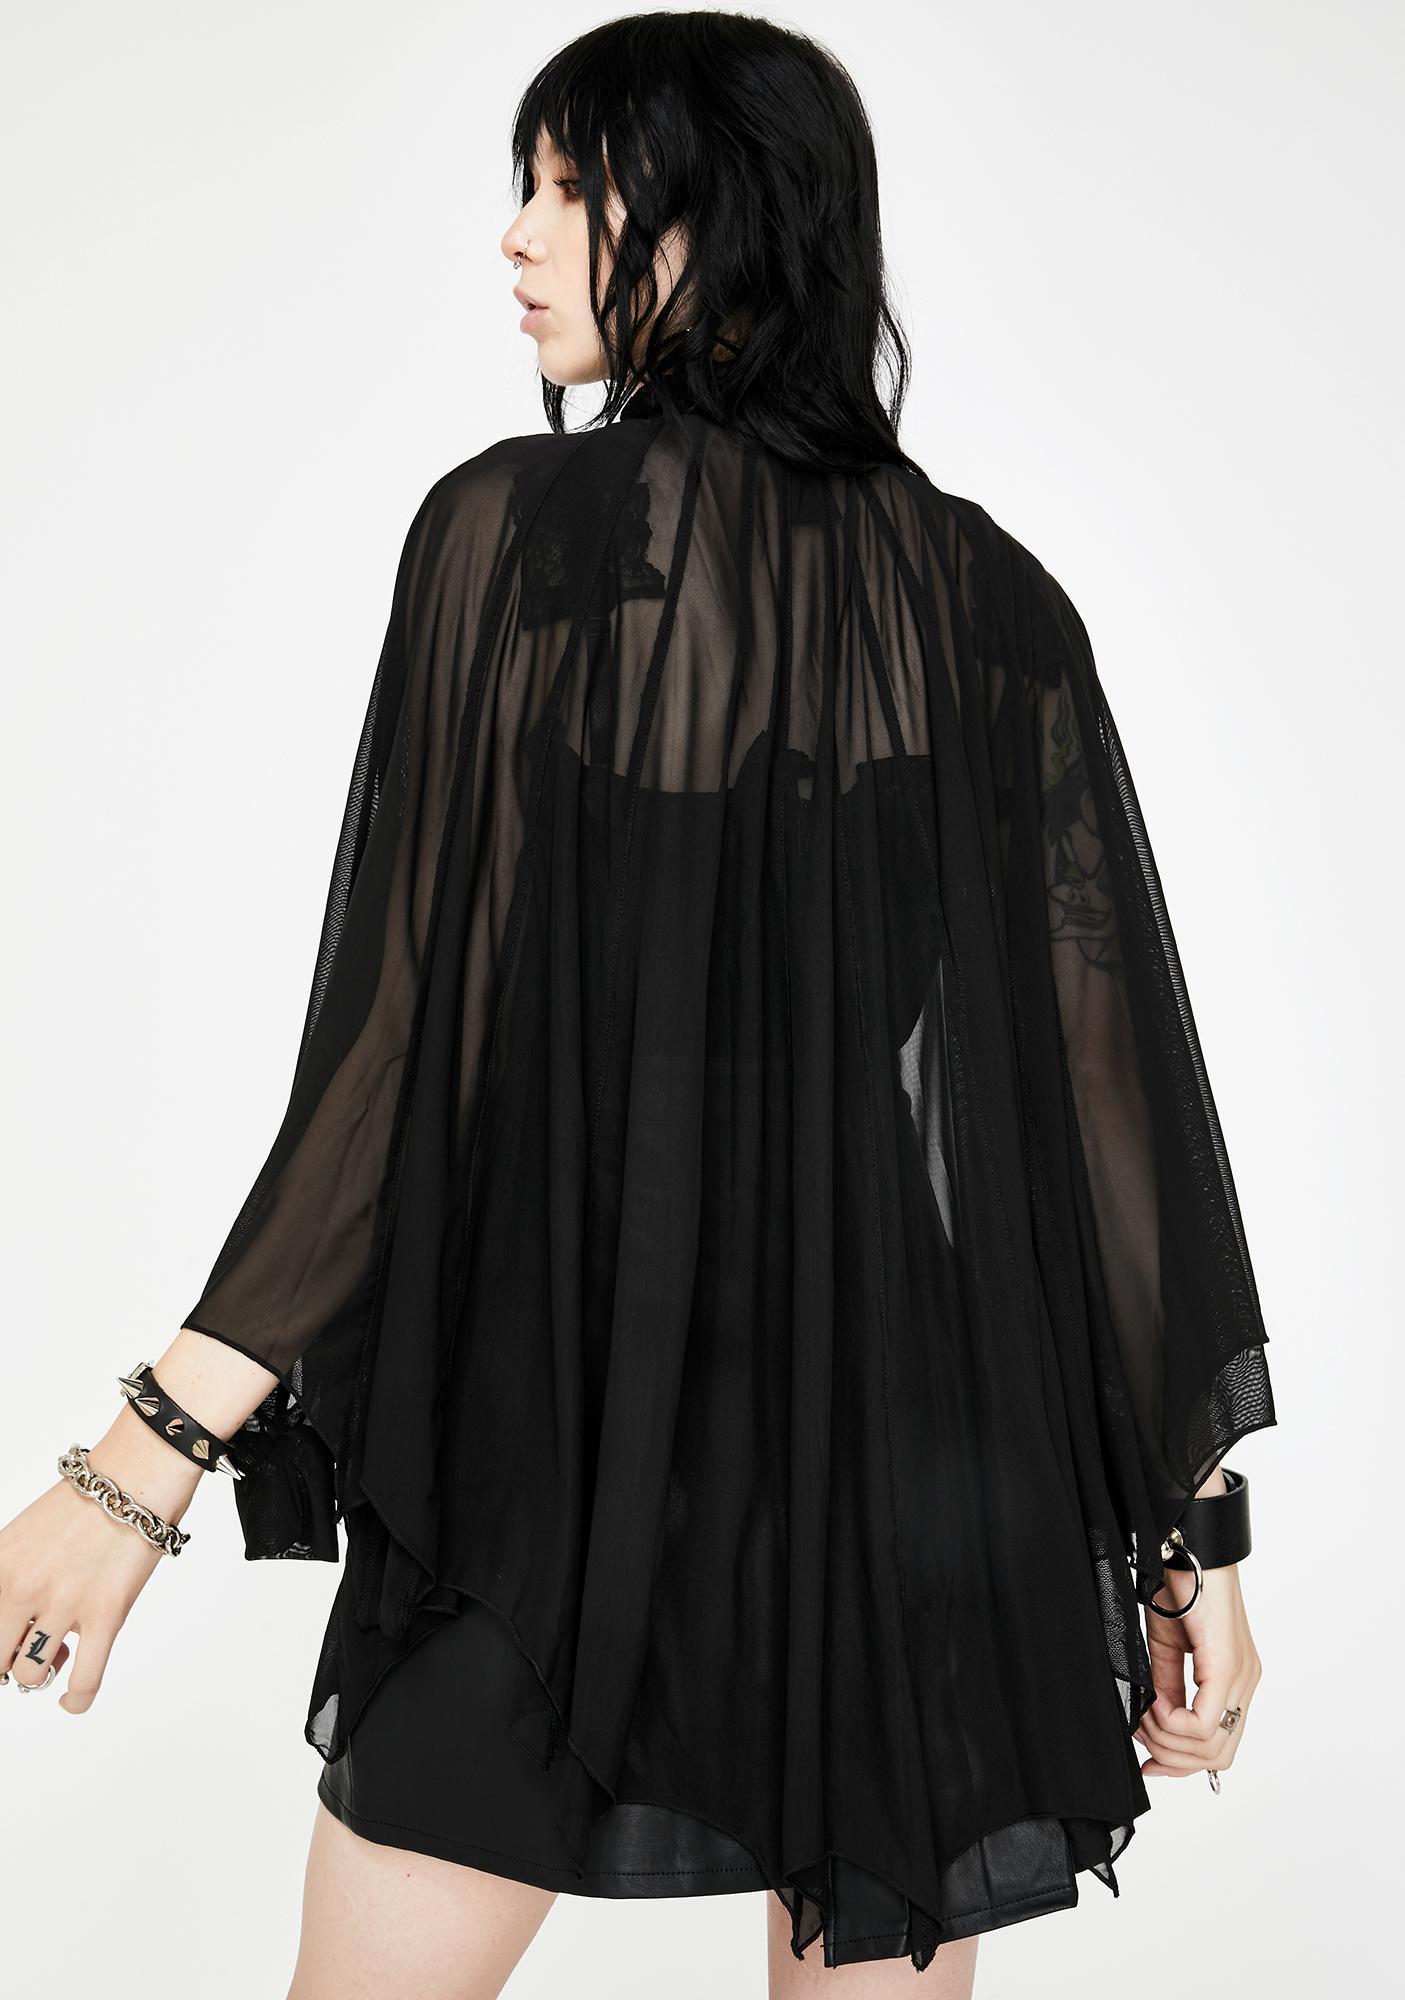 Necessary Evil Cybele Bat Wing Dress